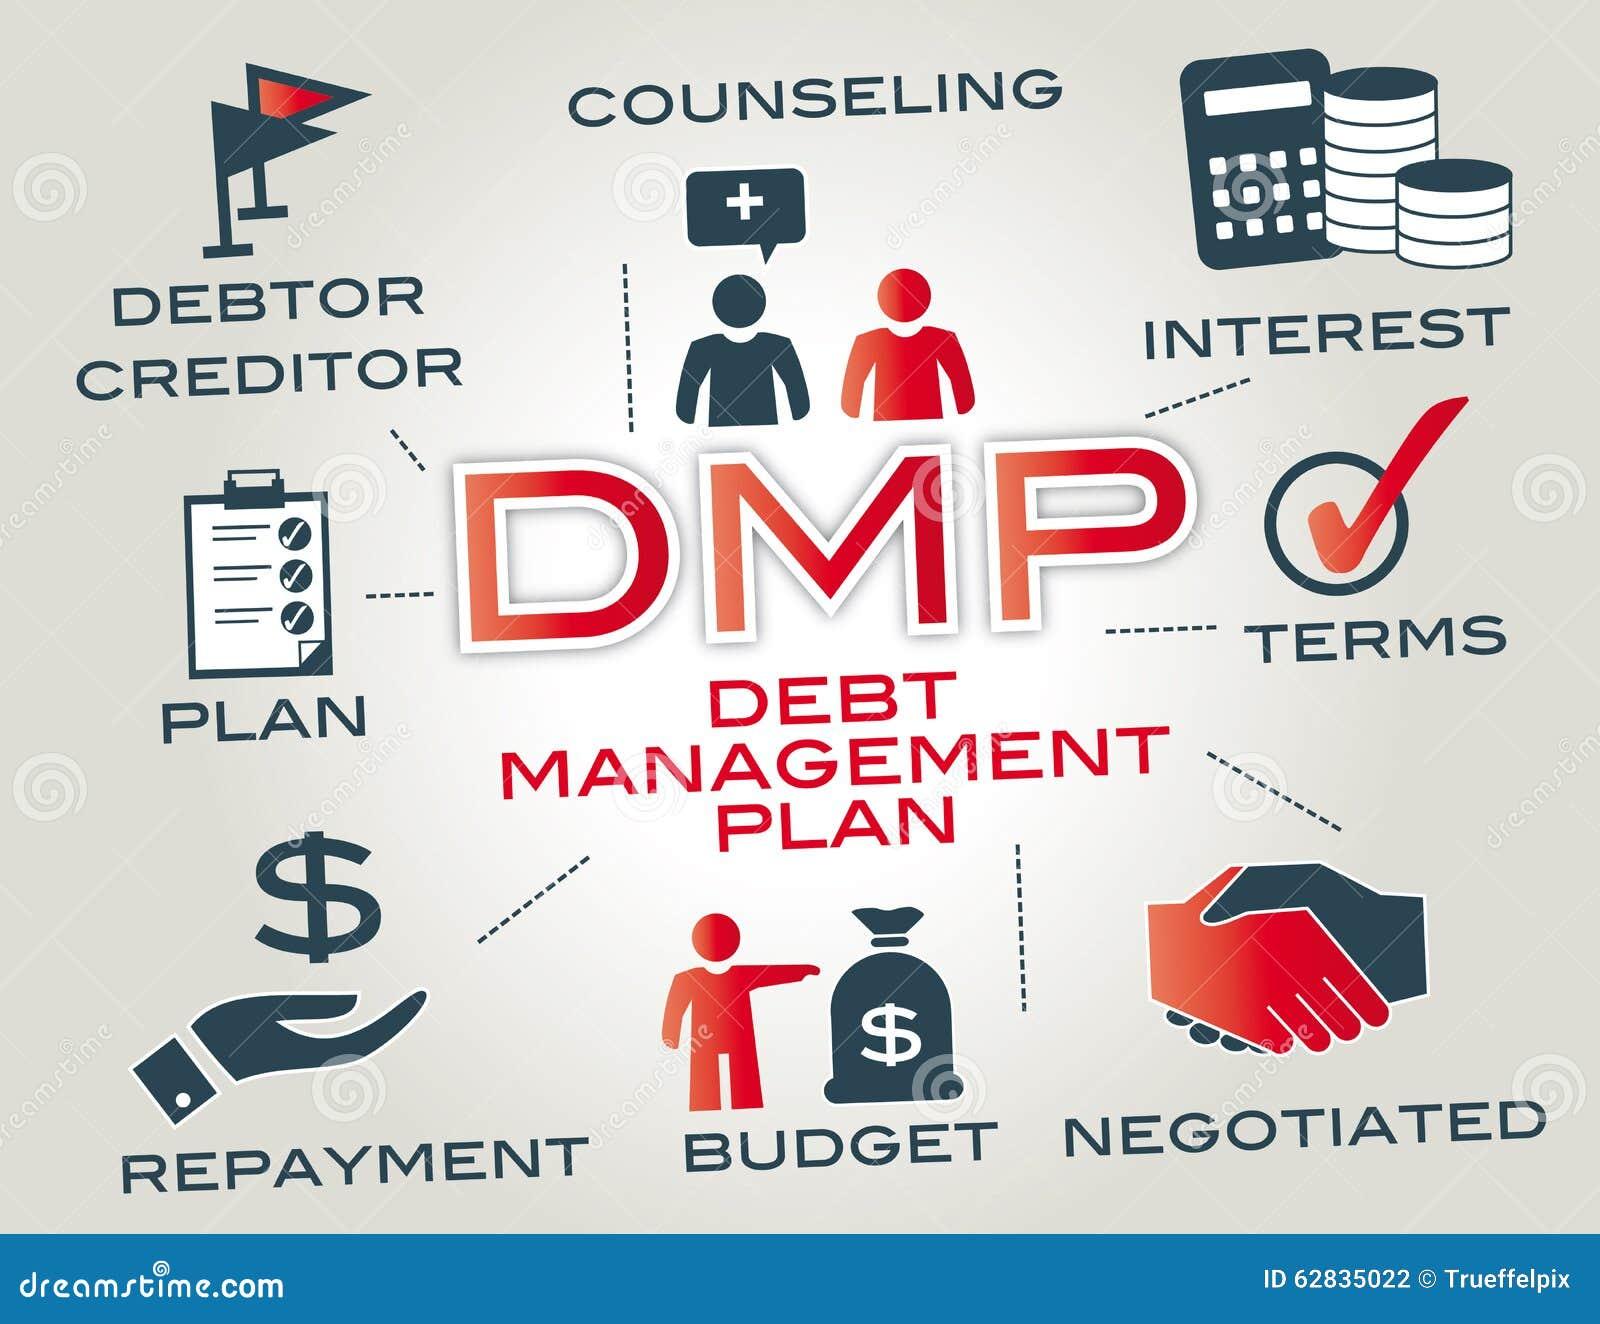 ba7914eb273 Dmp - debt management plan stock illustration. Illustration of ...